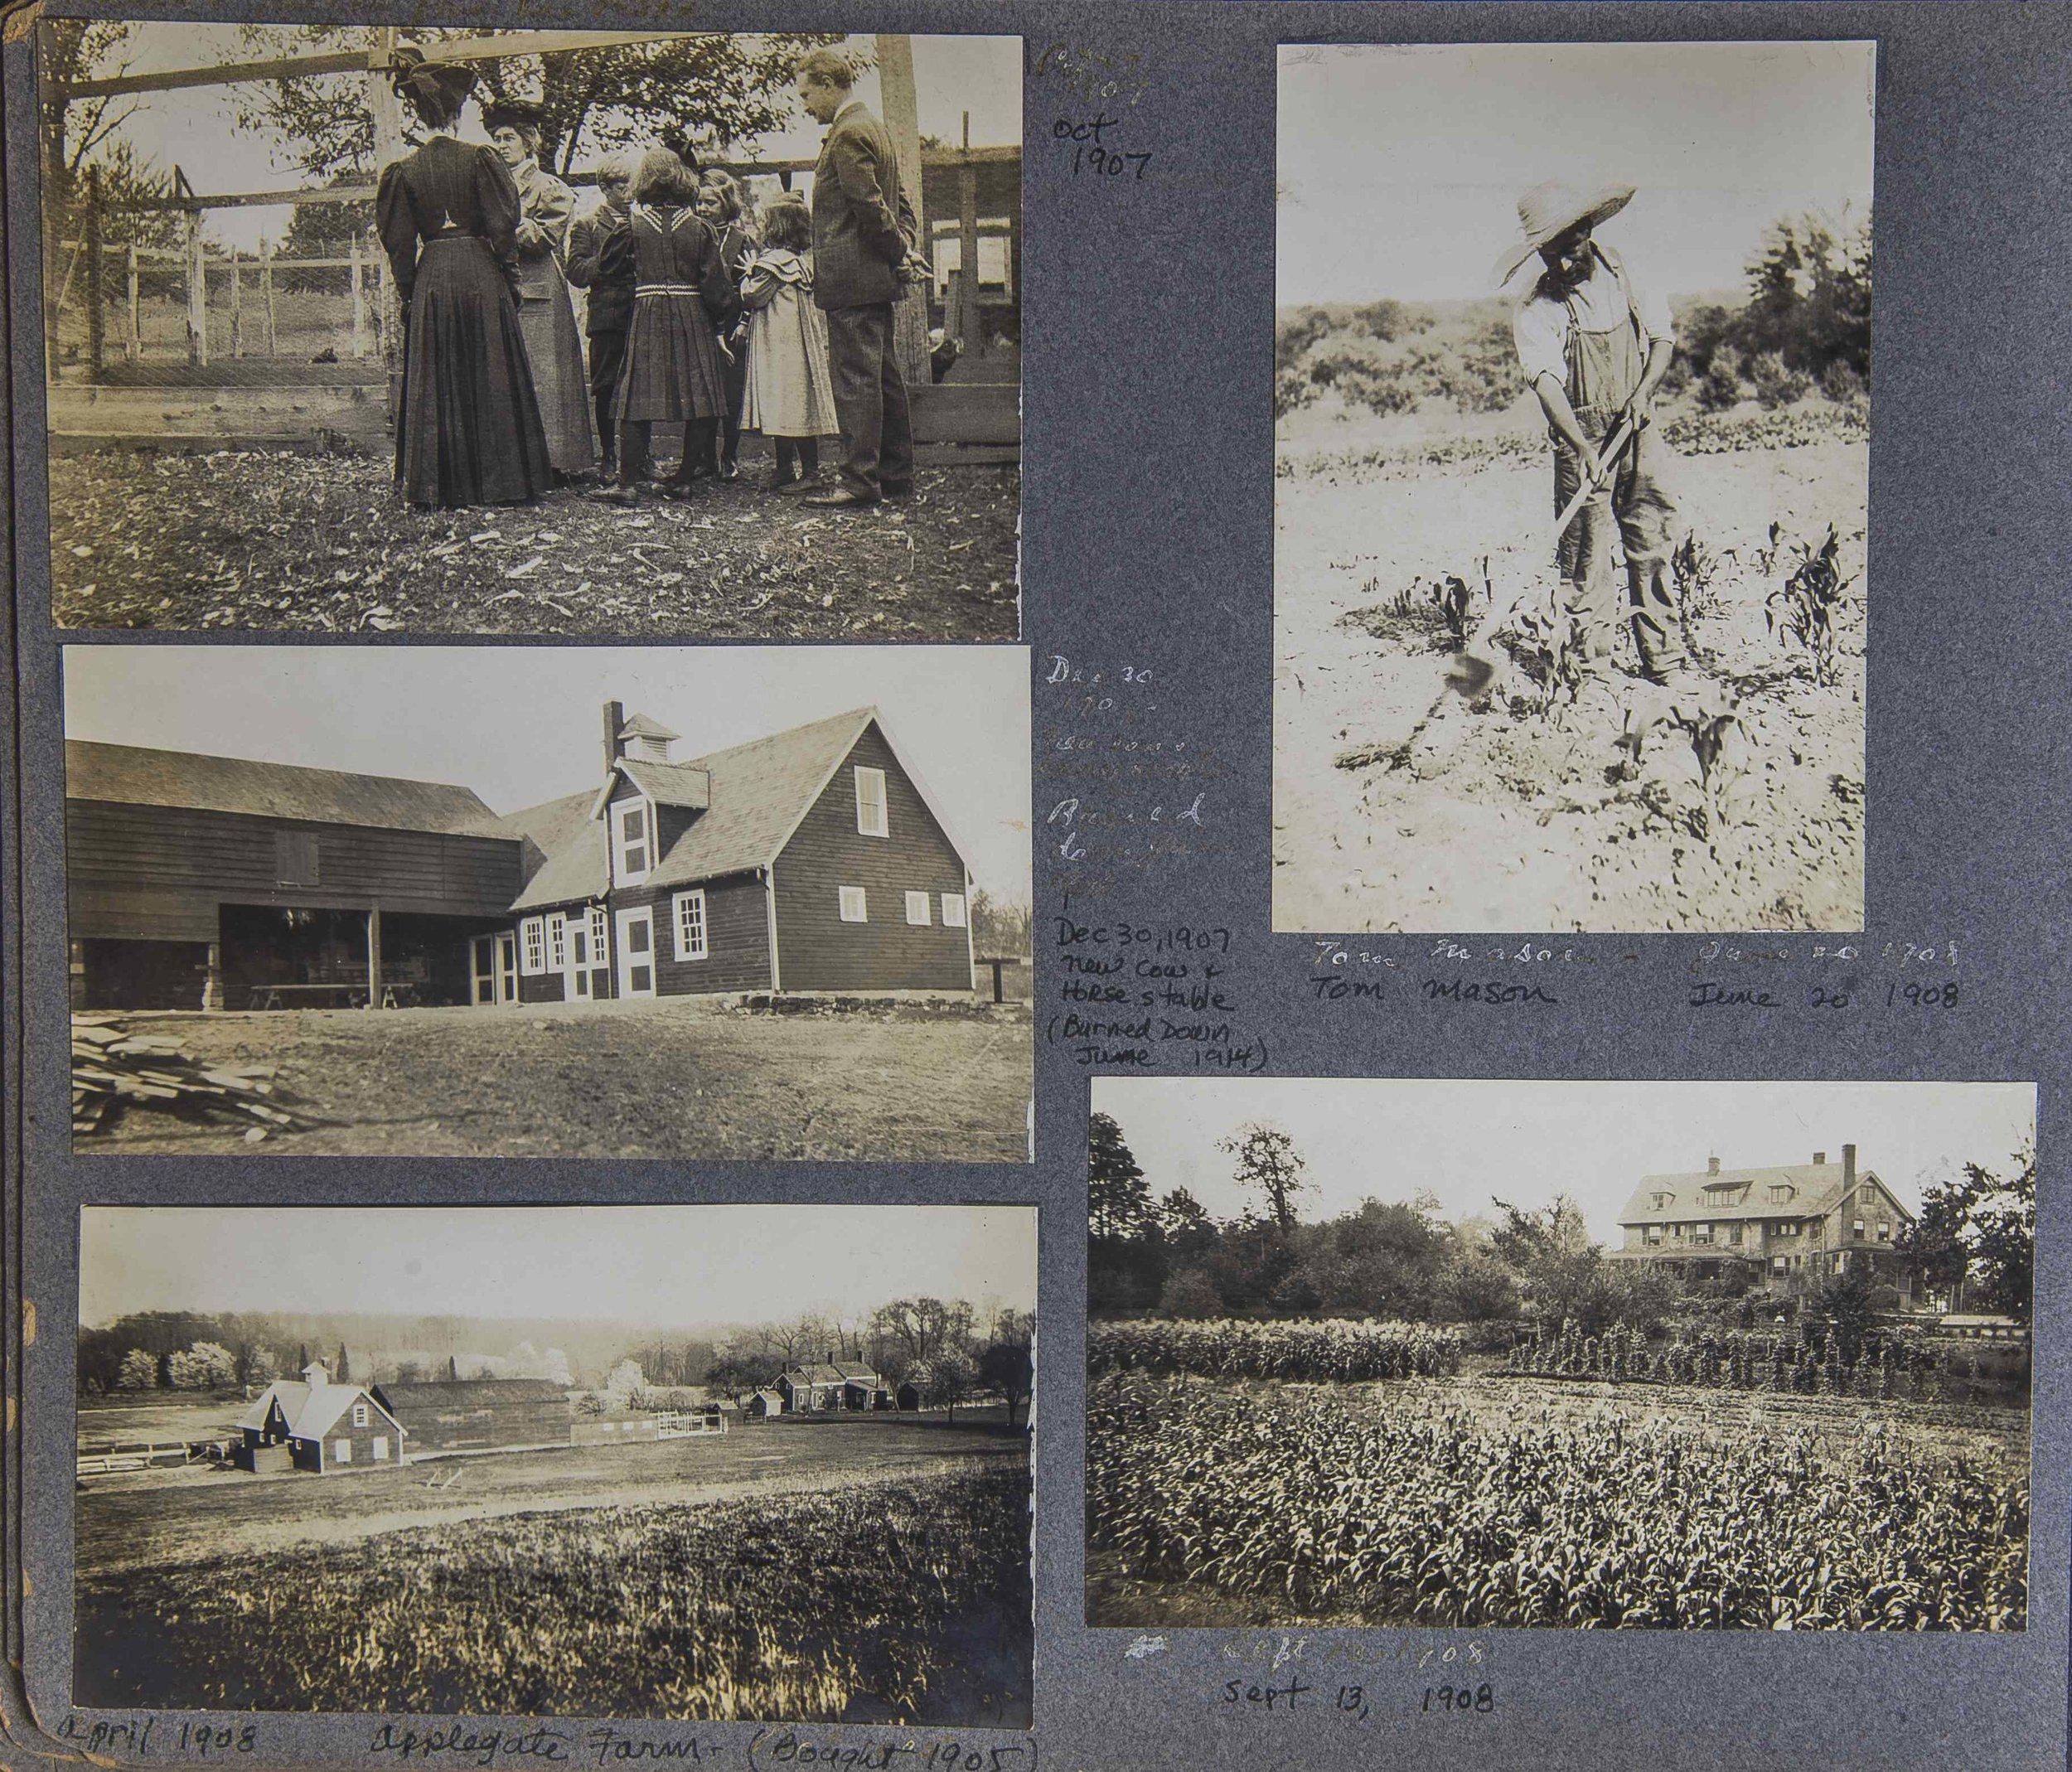 Applegate Farms Book Page_21.jpg